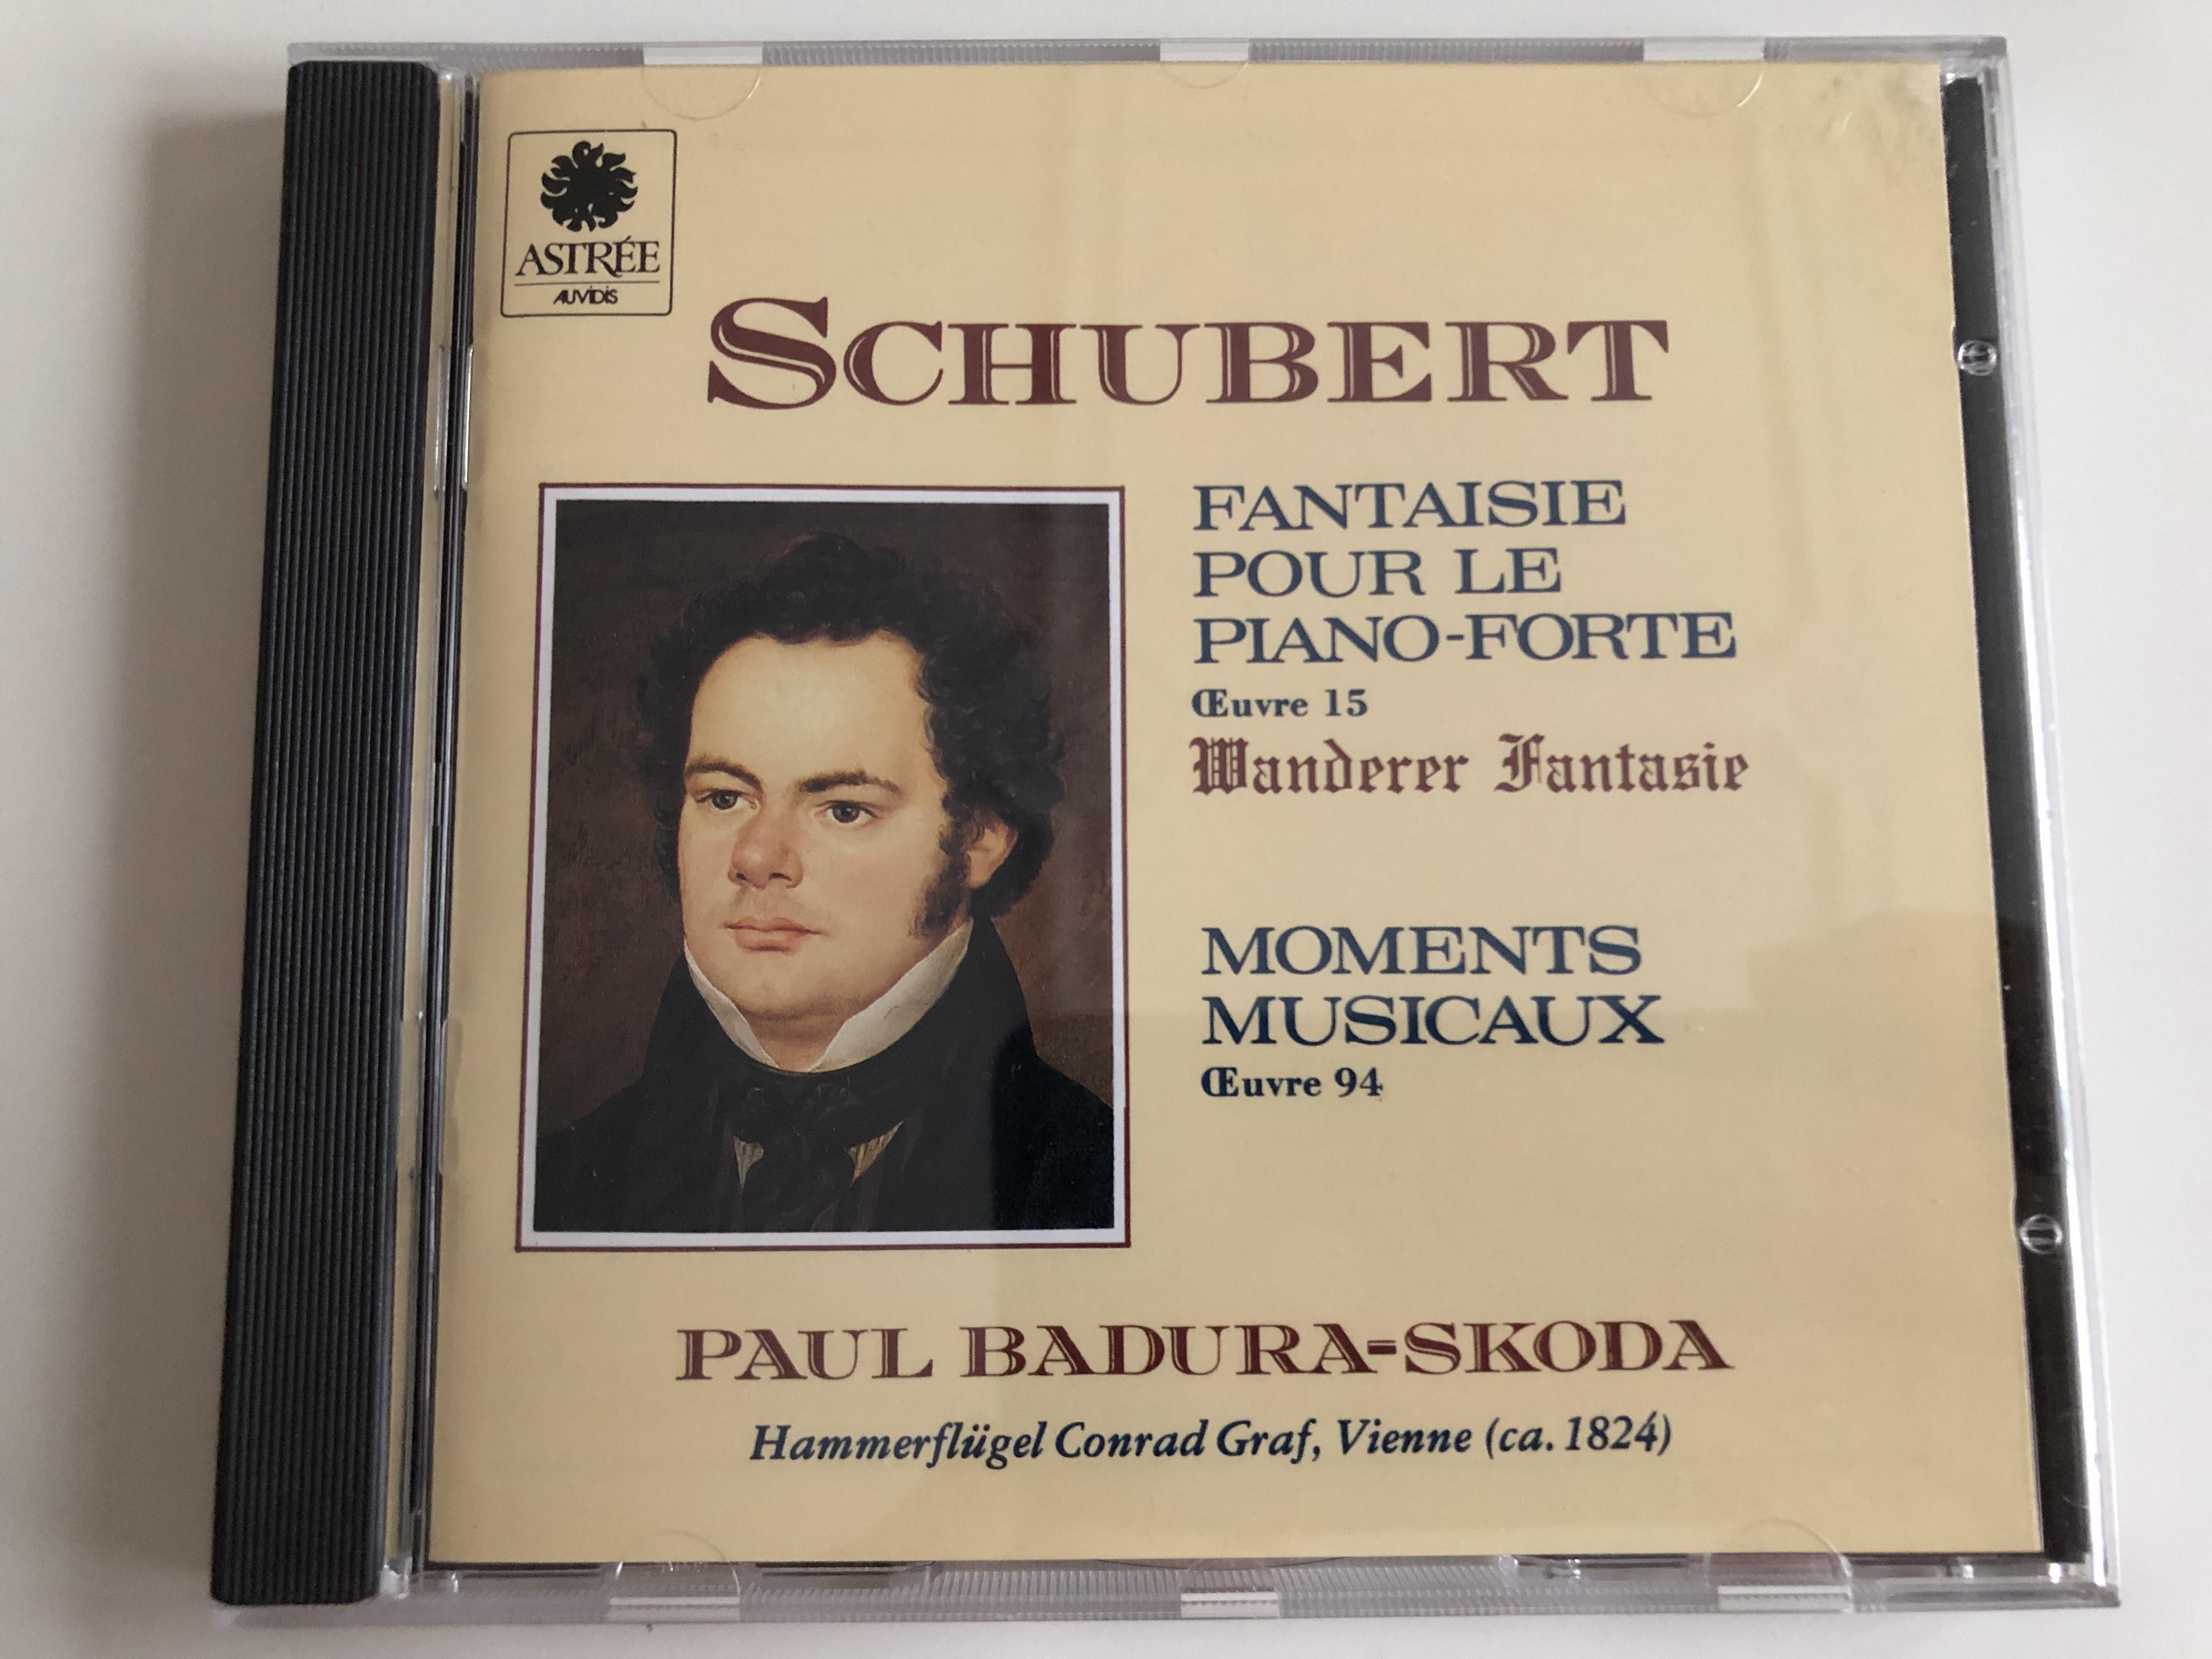 franz-schubert-fantaisie-pour-le-piano-forte-euvre-15-wanderer-fantasie-moments-musicaux-euvre-94-paul-badura-skoda-hammerfl-gel-conrad-graf-vienna-ca.-1824-audio-cd-e7763-auvidis-1-.jpg